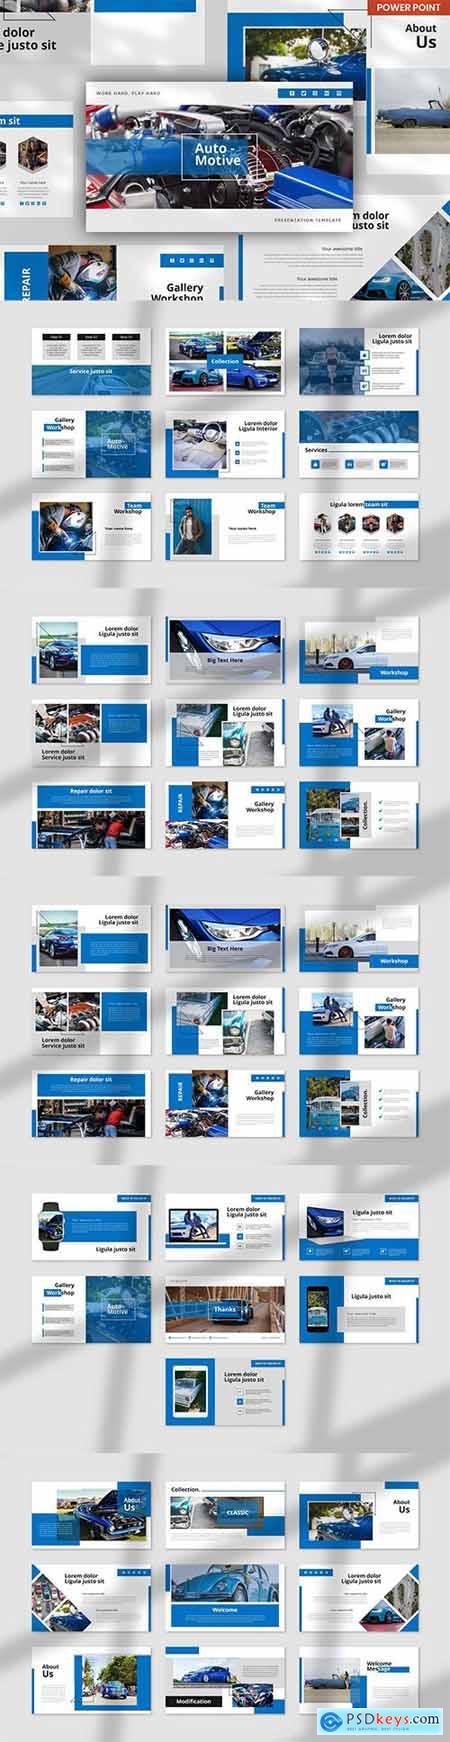 Autocar Automotive - PowerPoint, Keynote and Google Slides Template